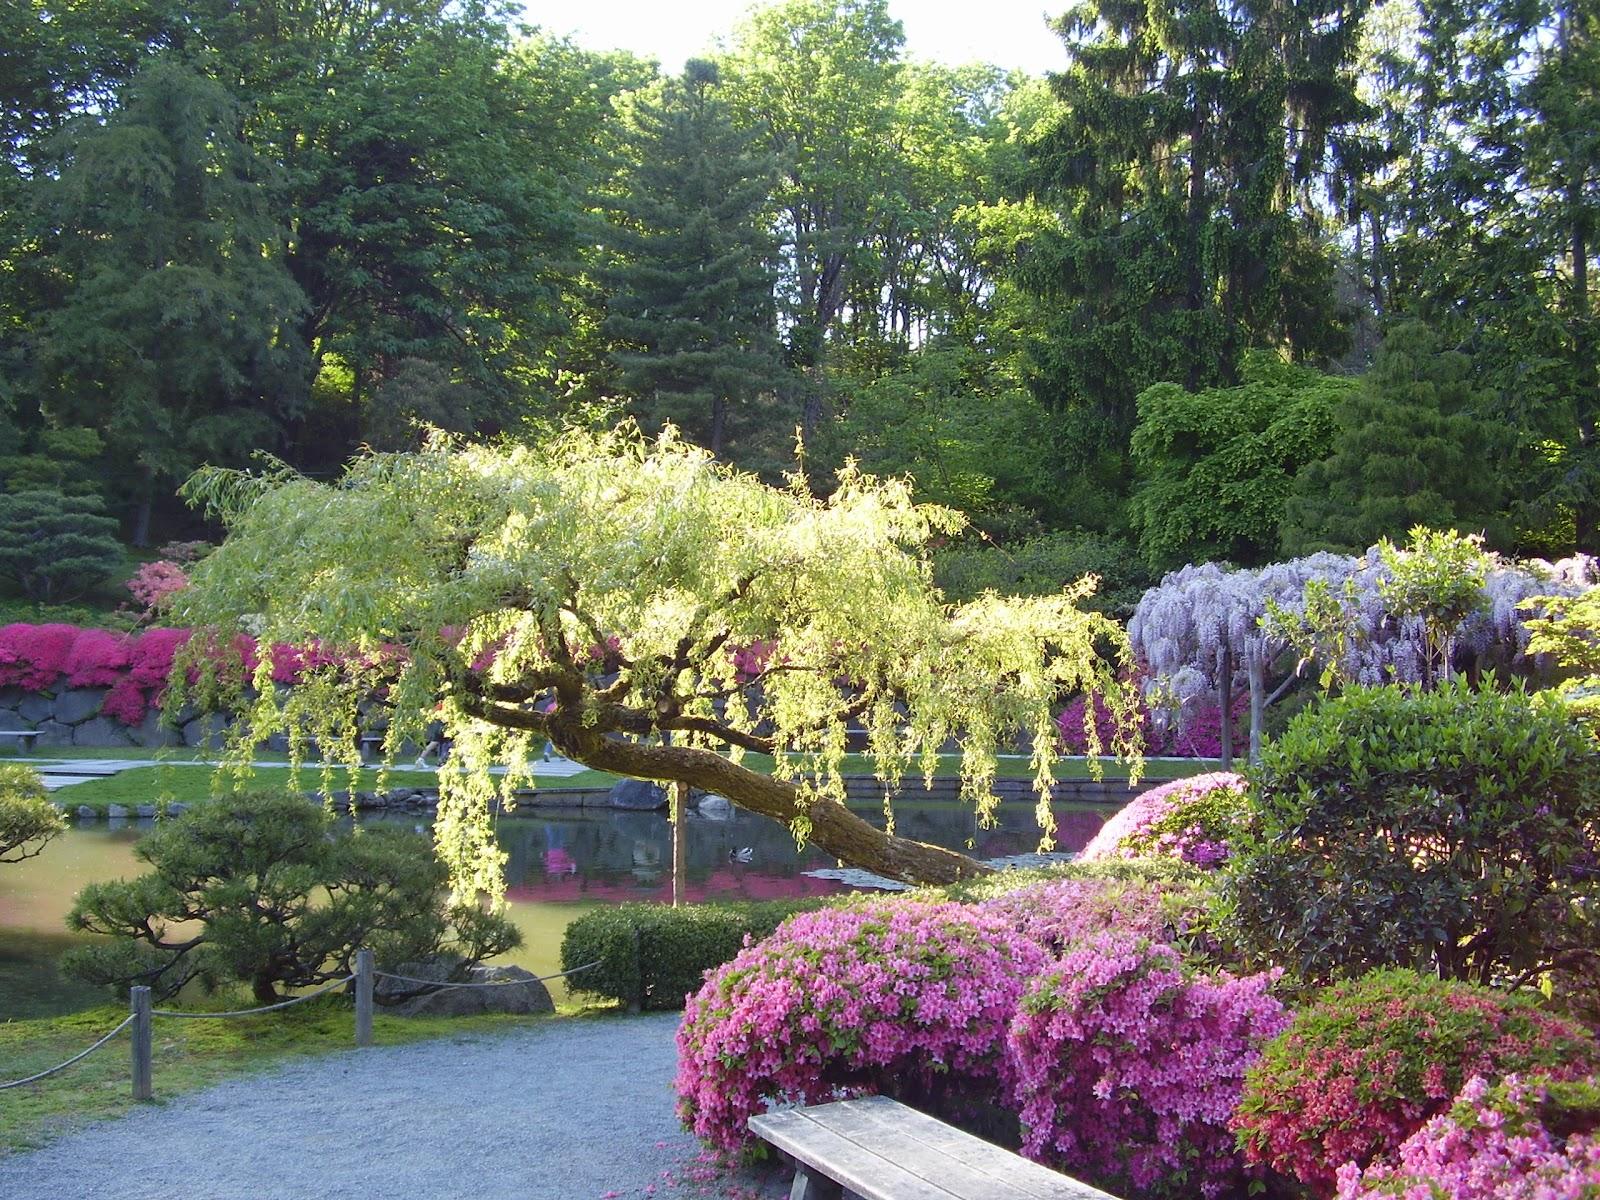 Japan Garden Flowers: Beautiful Japanese Garden Wallpapers